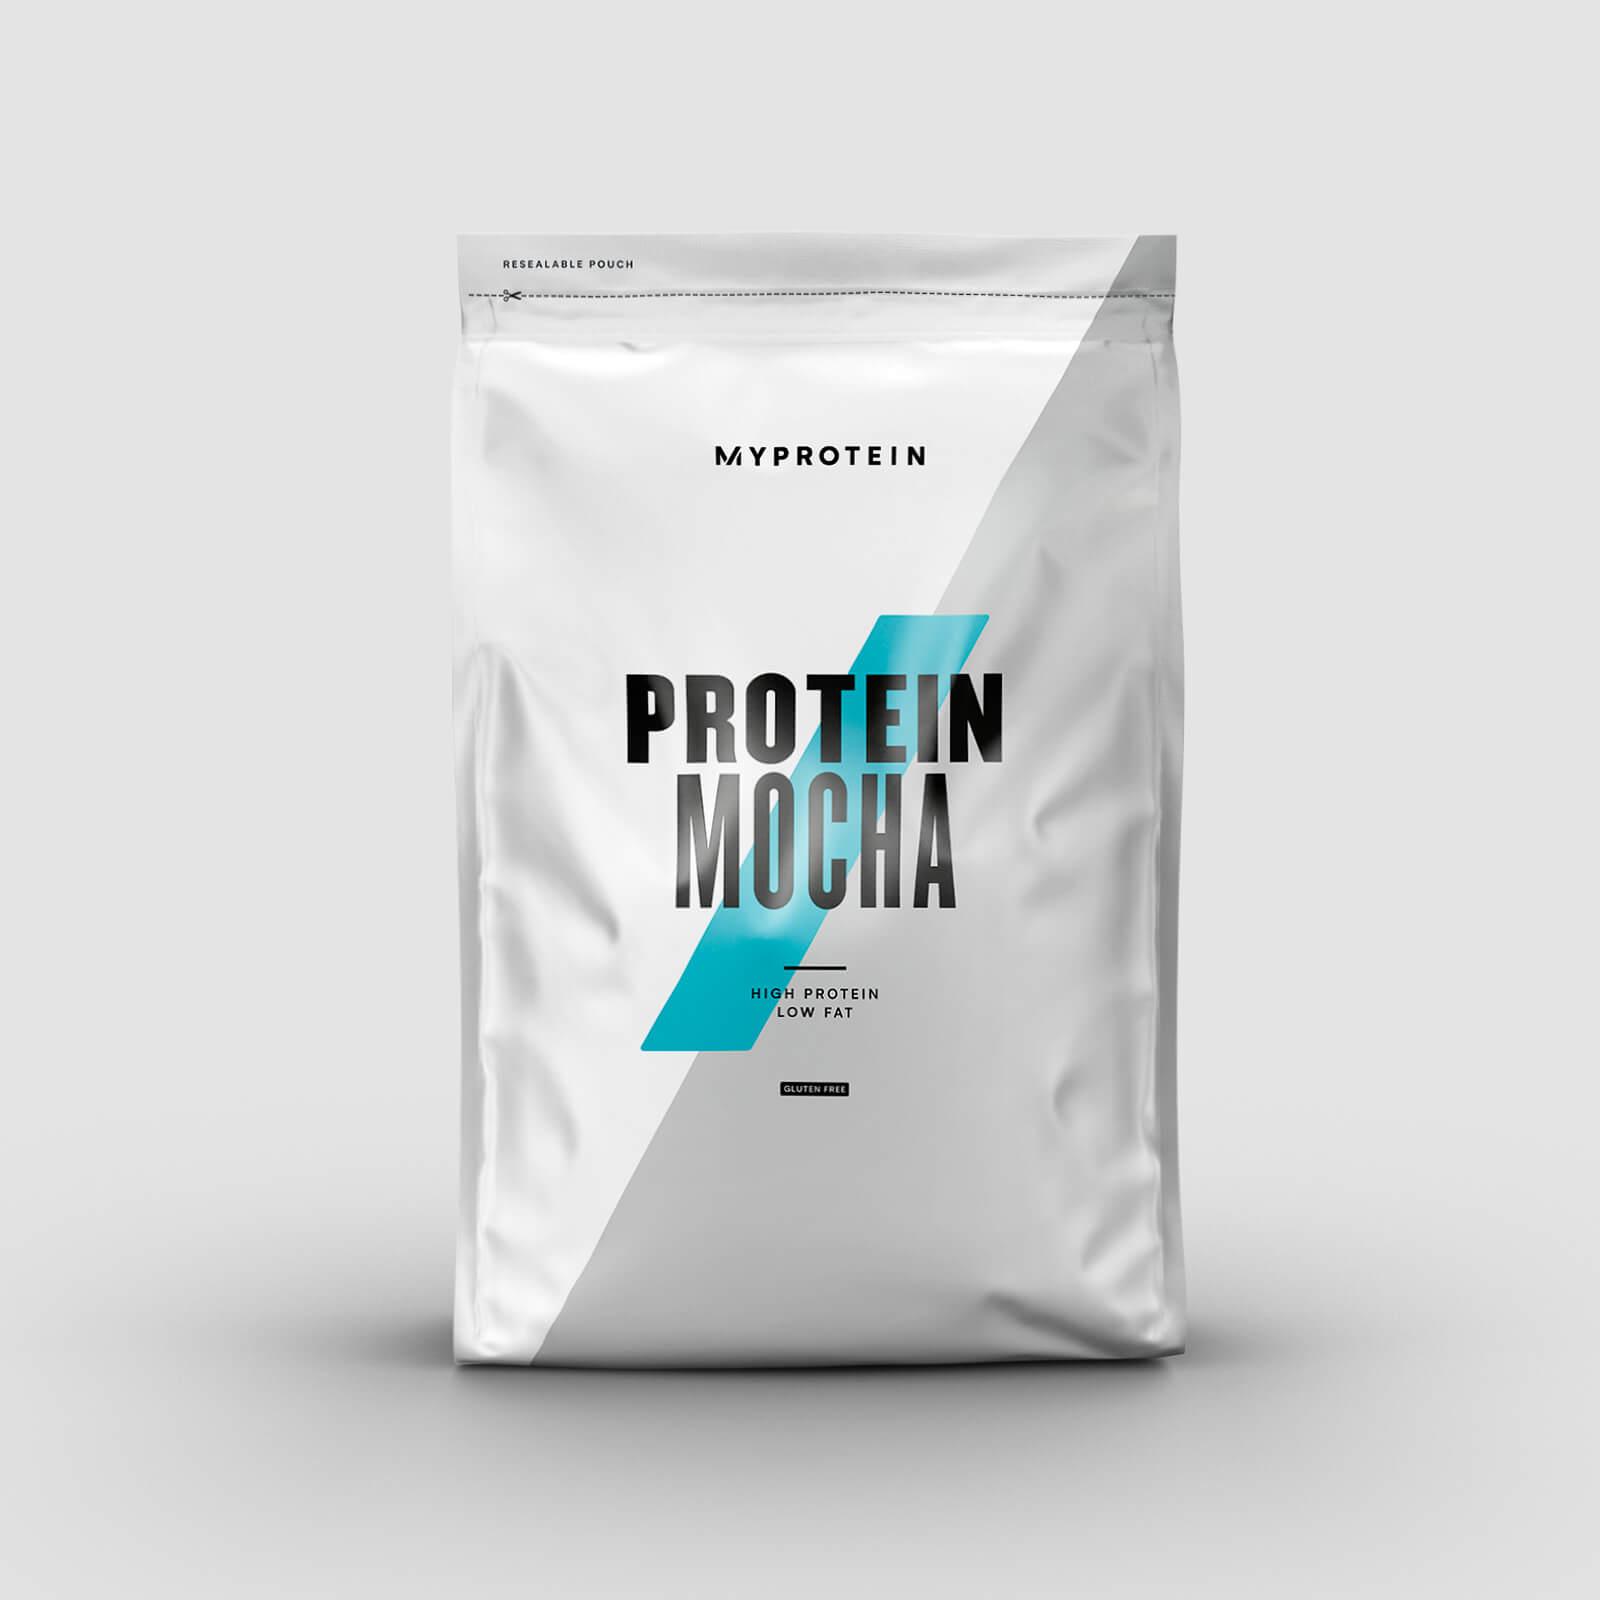 Myprotein Mocaccino Proteico - 1000g - Caffè latte con cacao